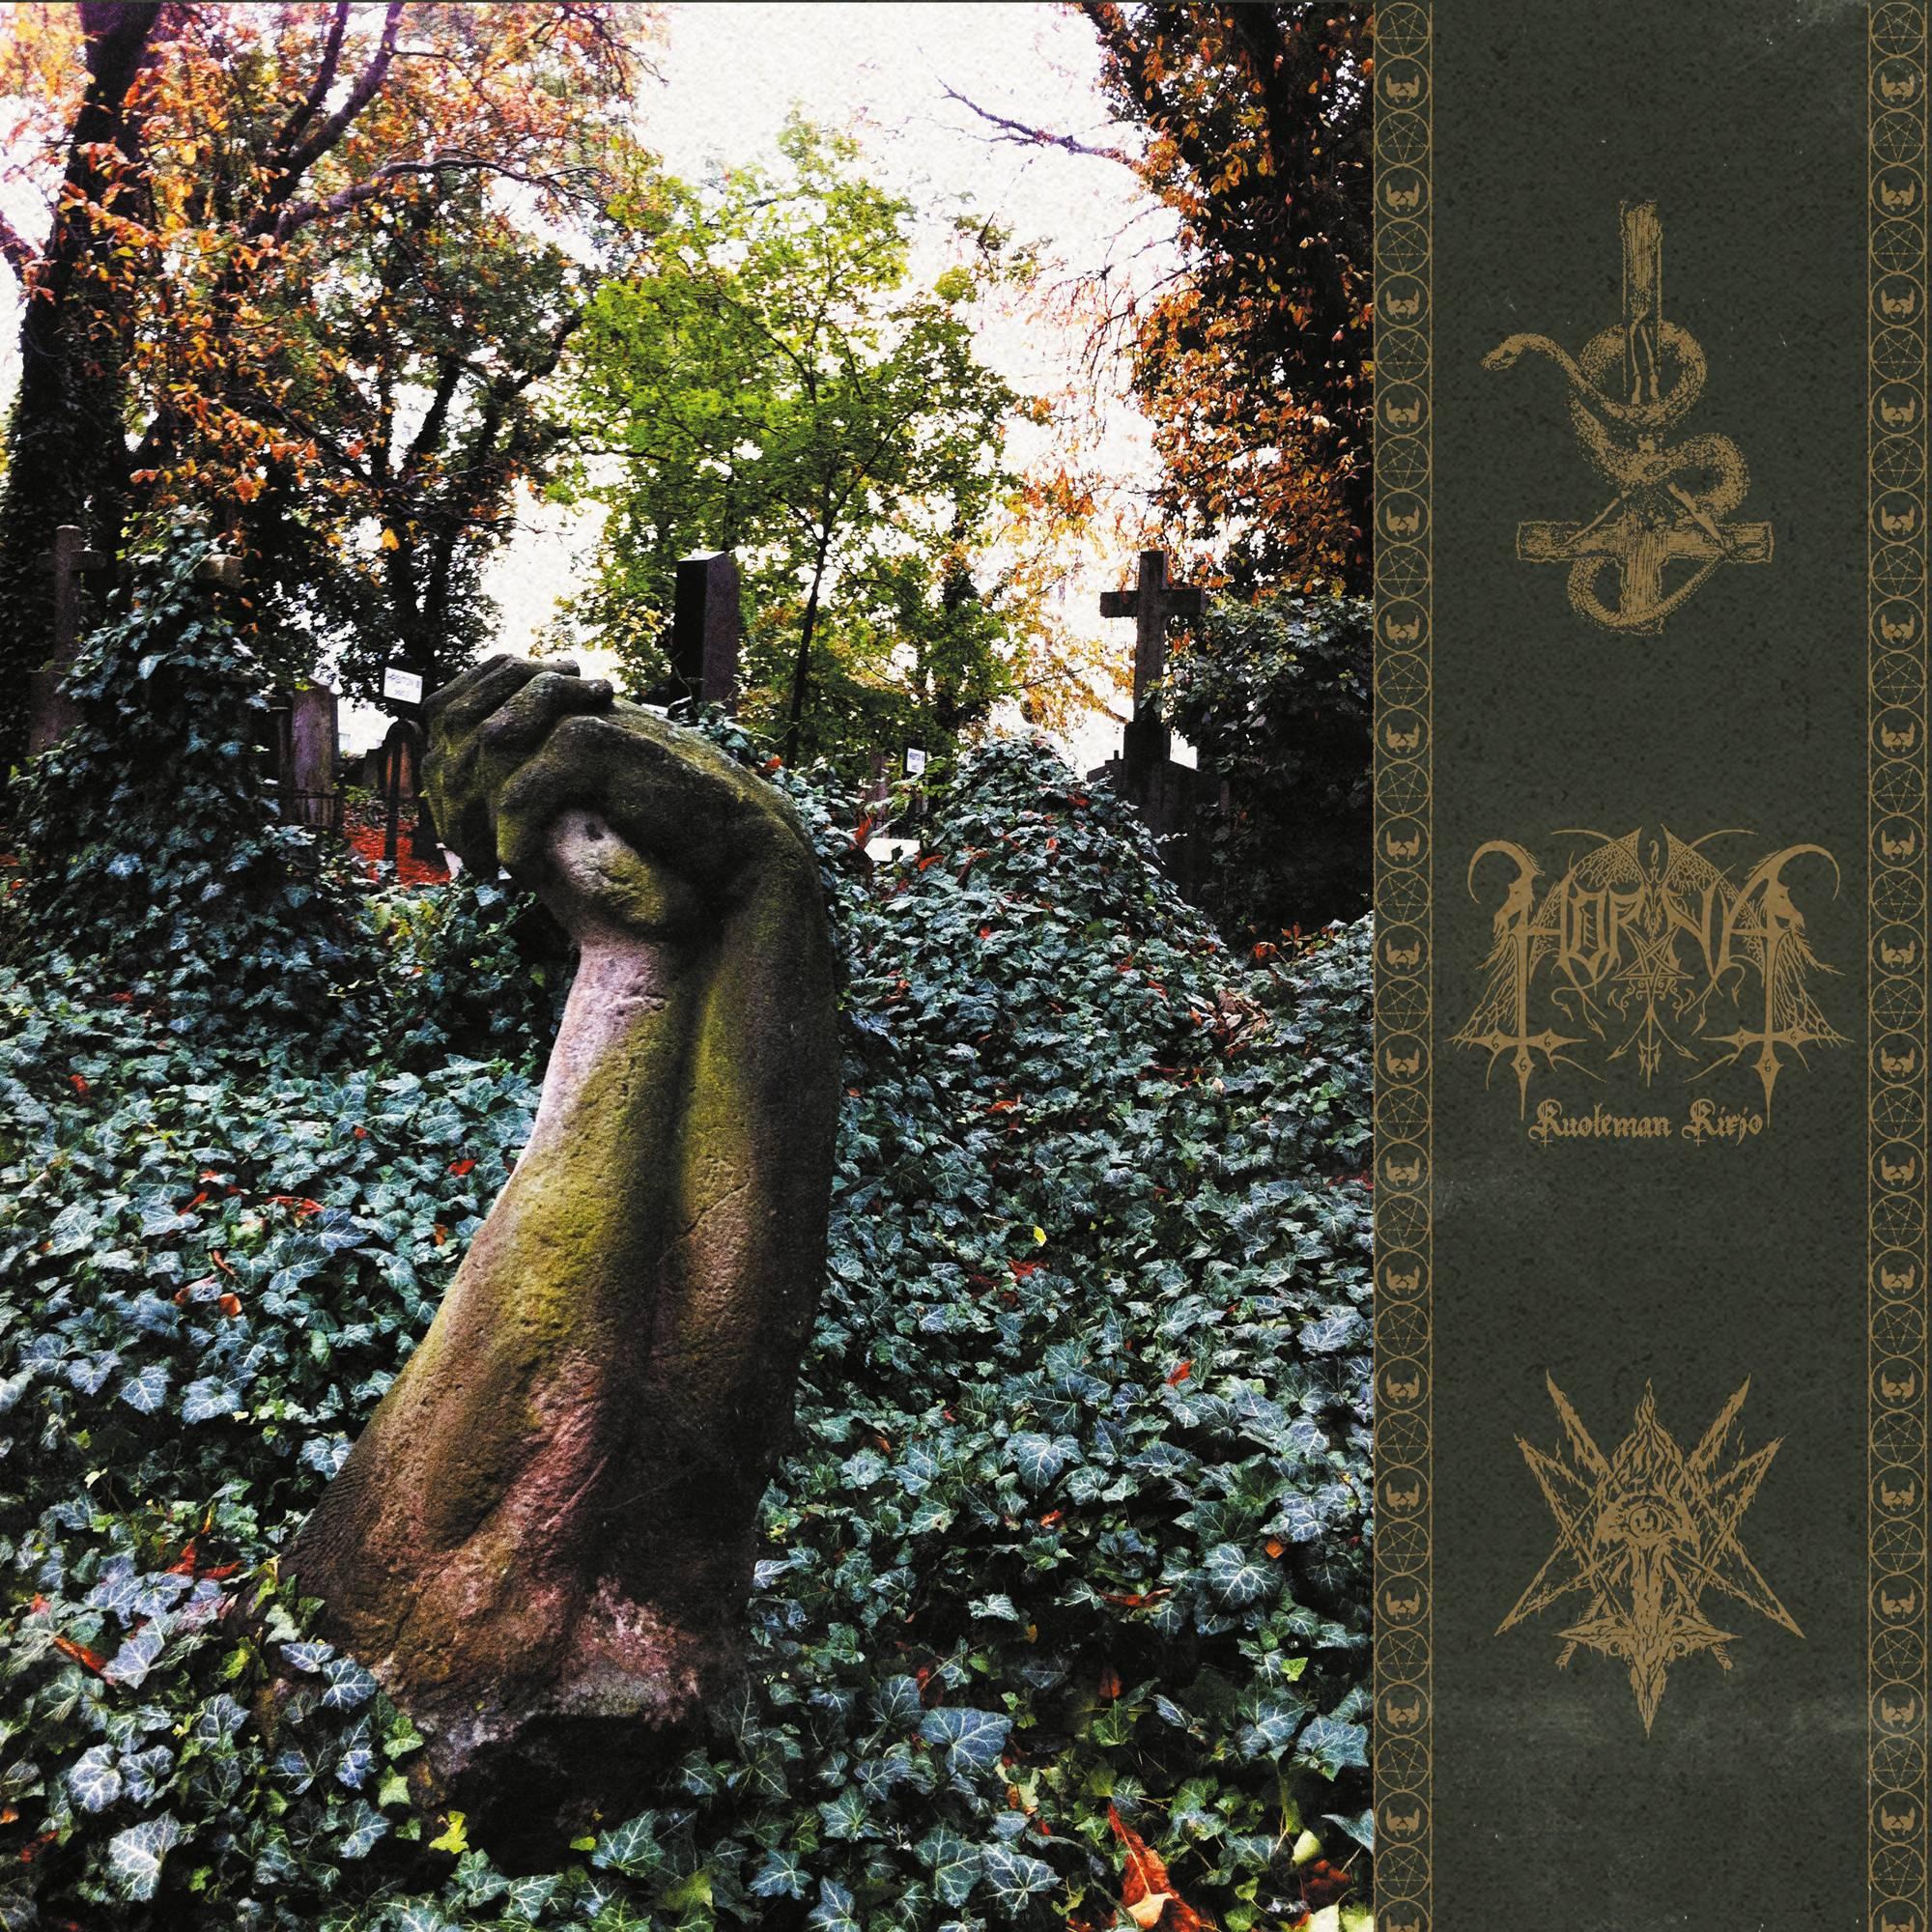 REVIEW: Horna – Kuoleman Kirjo